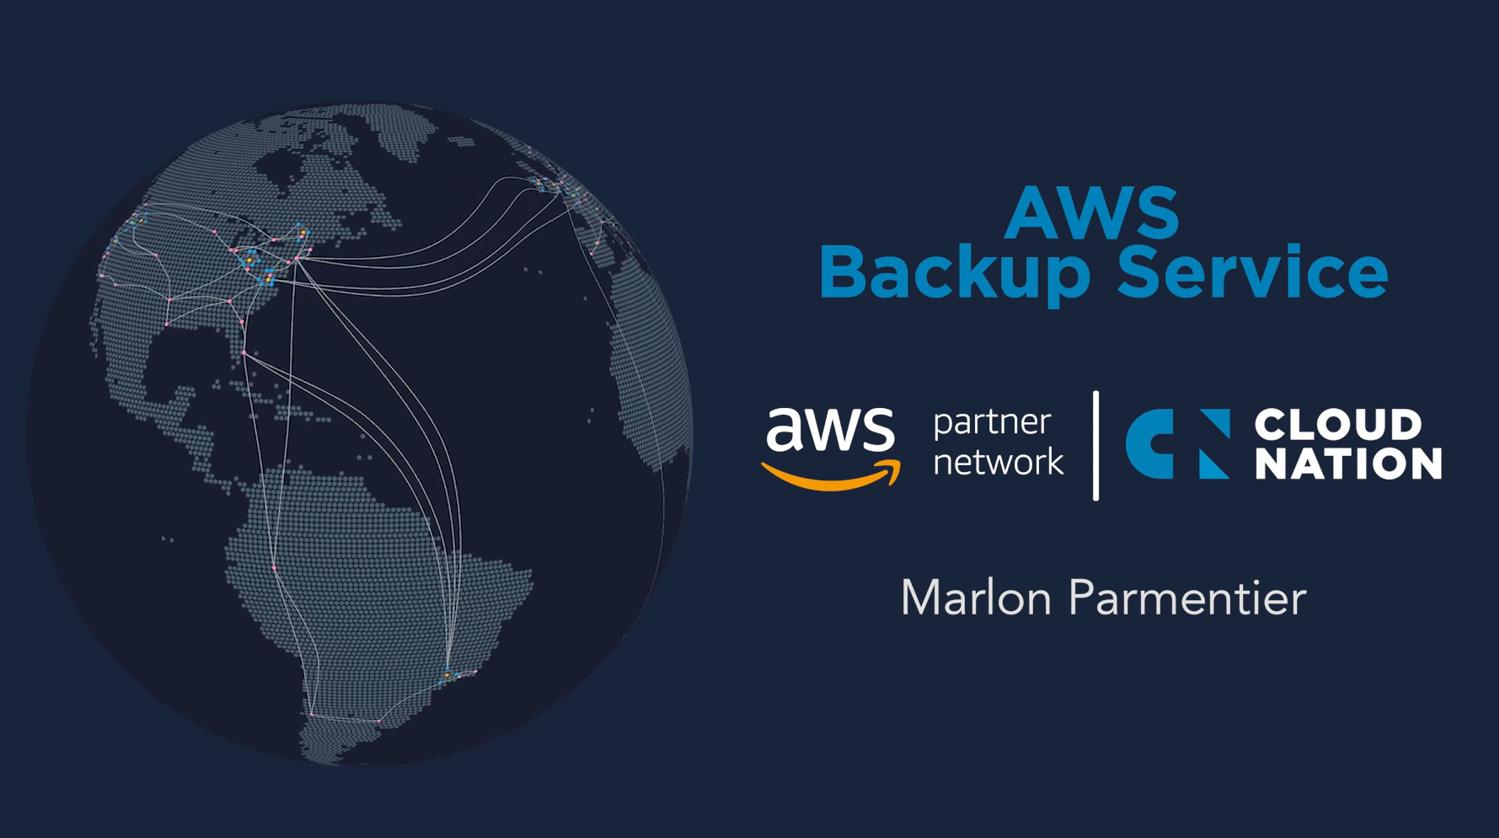 AWS Backup service